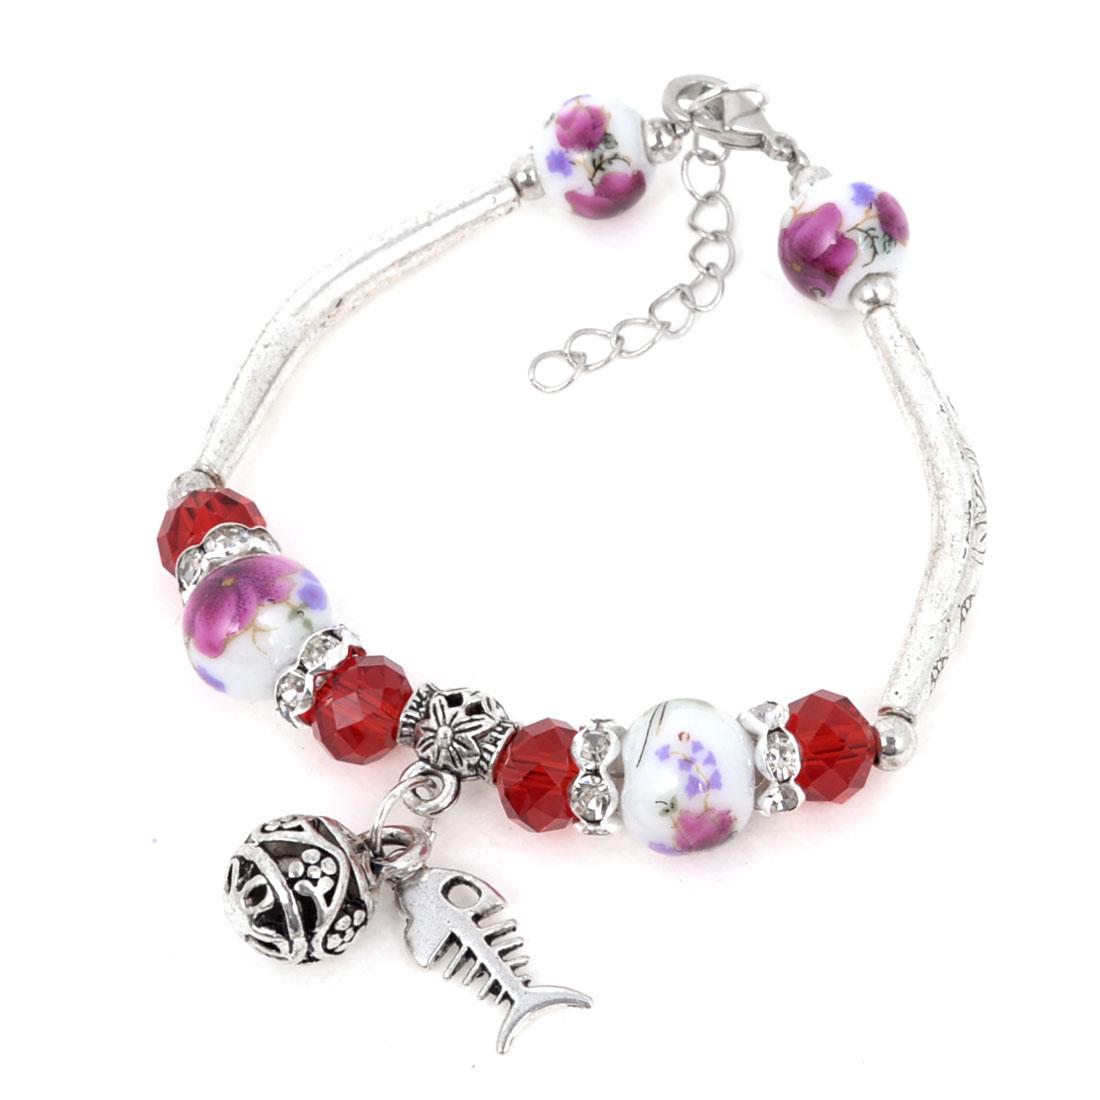 Lady Sliver Tone Fishbone Pandent Manmade Red Crystal Linked Round Bead Bracelet